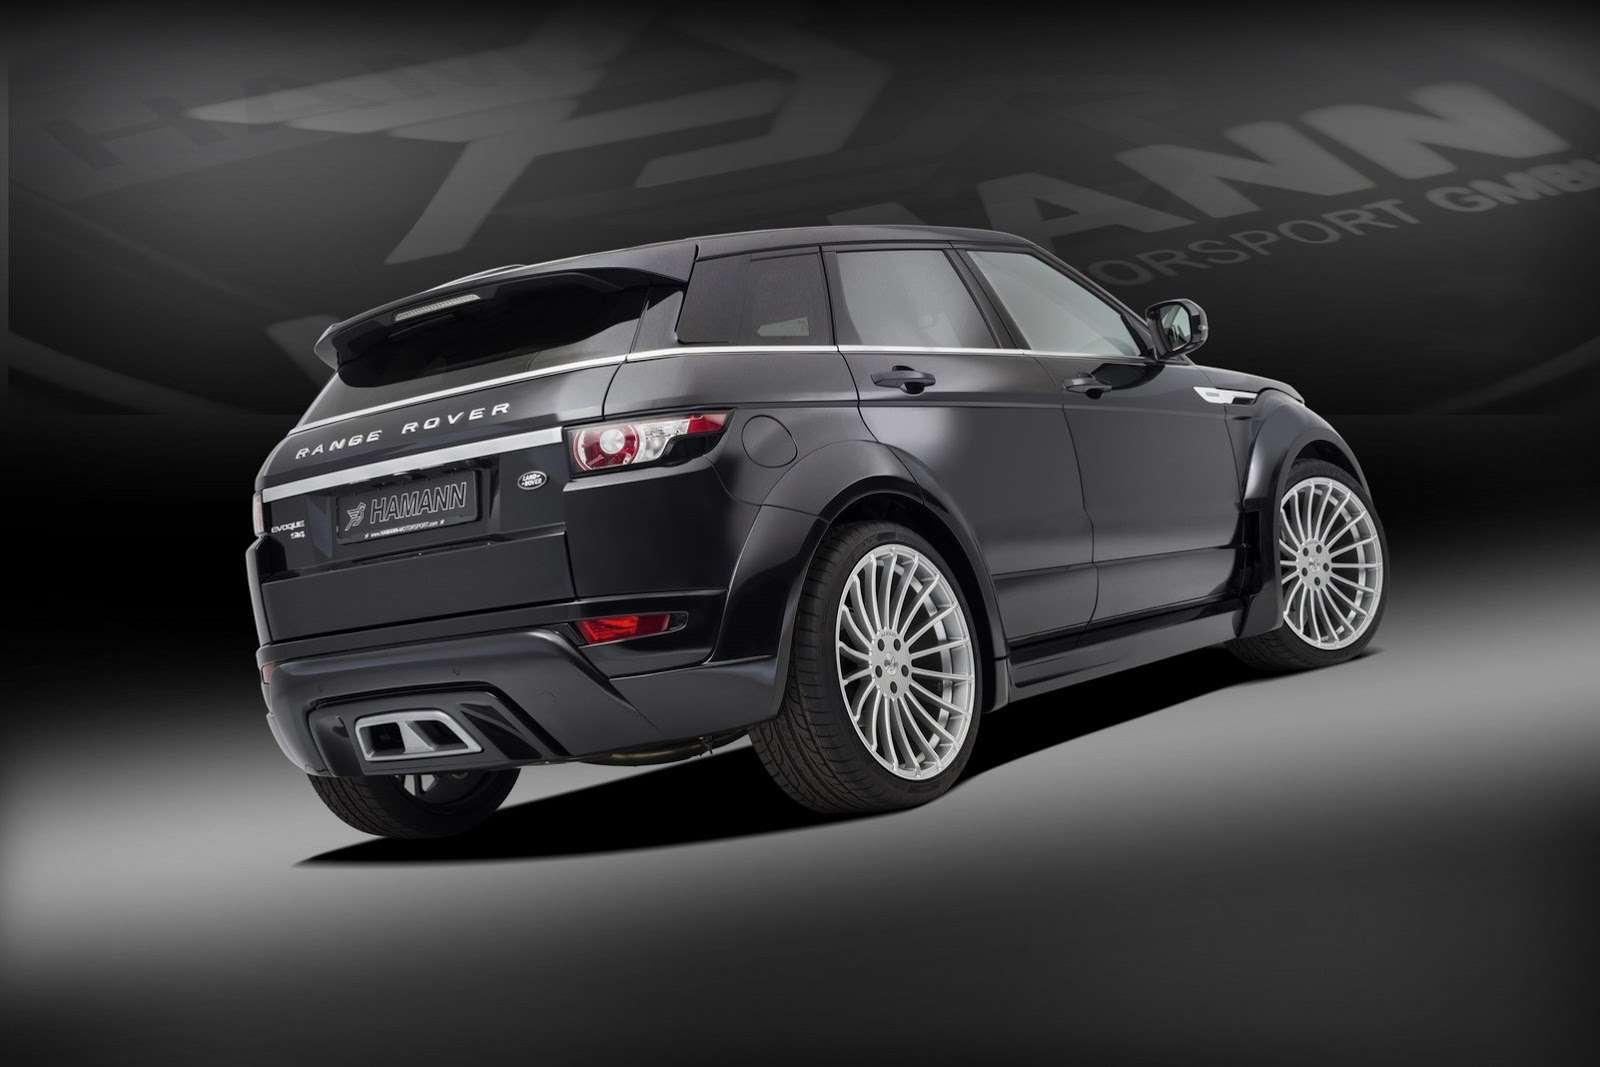 Range Rover Hamann Frankfurt 2013